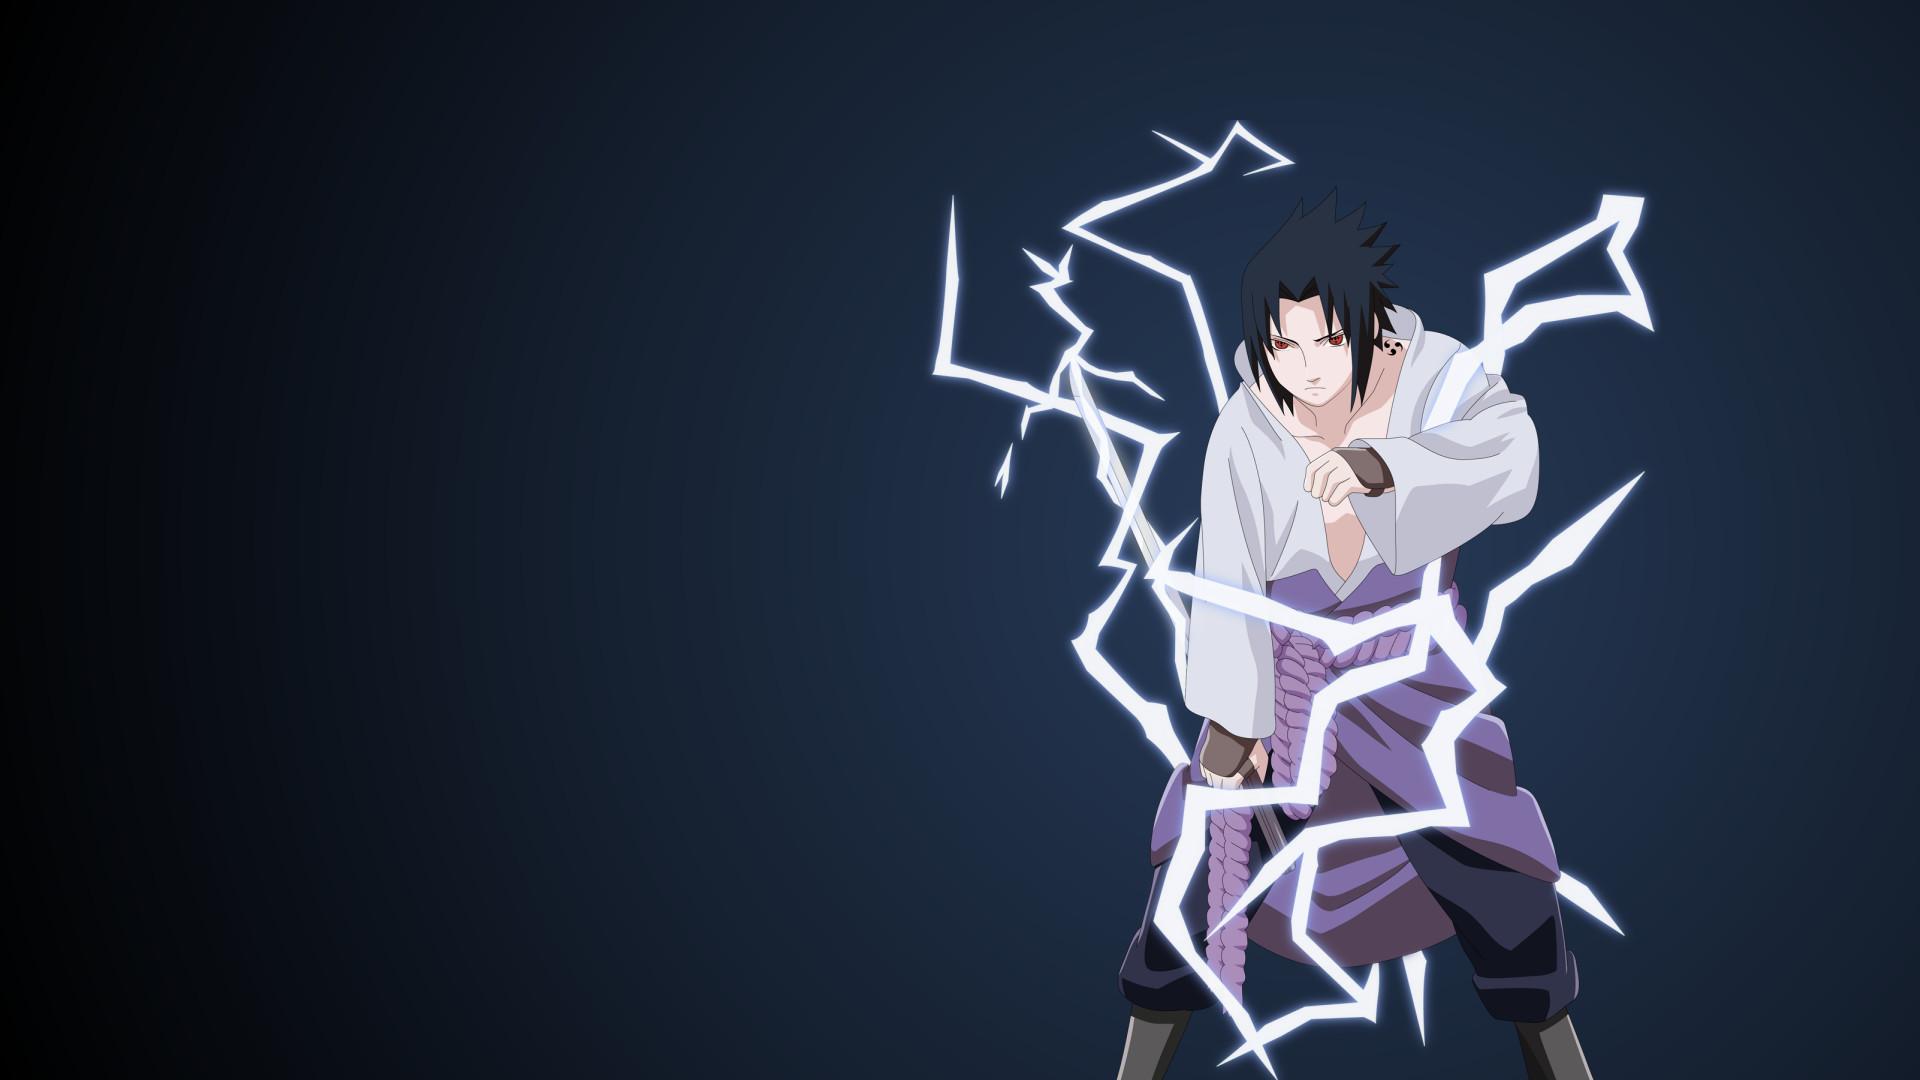 sasuke chidori wallpaper (53+ images)